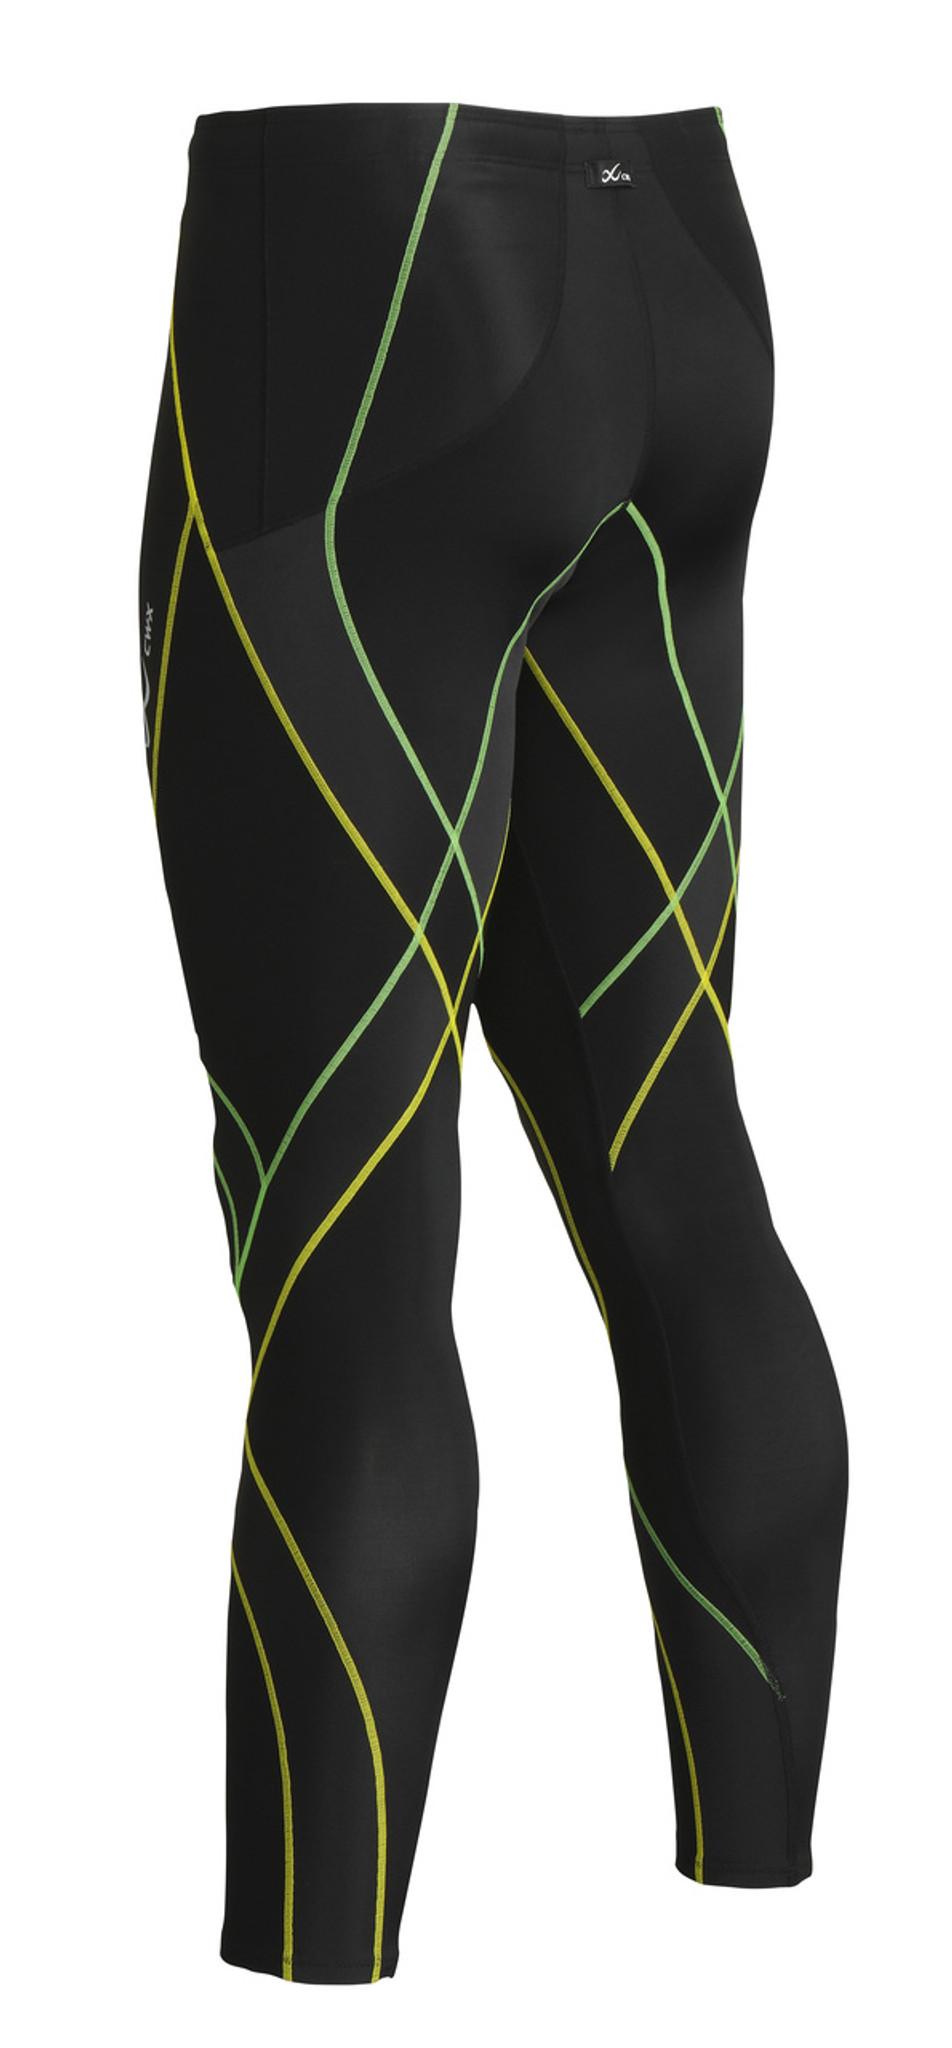 6902fbed8b7059 Home · Run · CW-X Mens Endurance Generator Tights 229809 · Black / Green /  Yellow - Front. Black / Green / Yellow - Rear